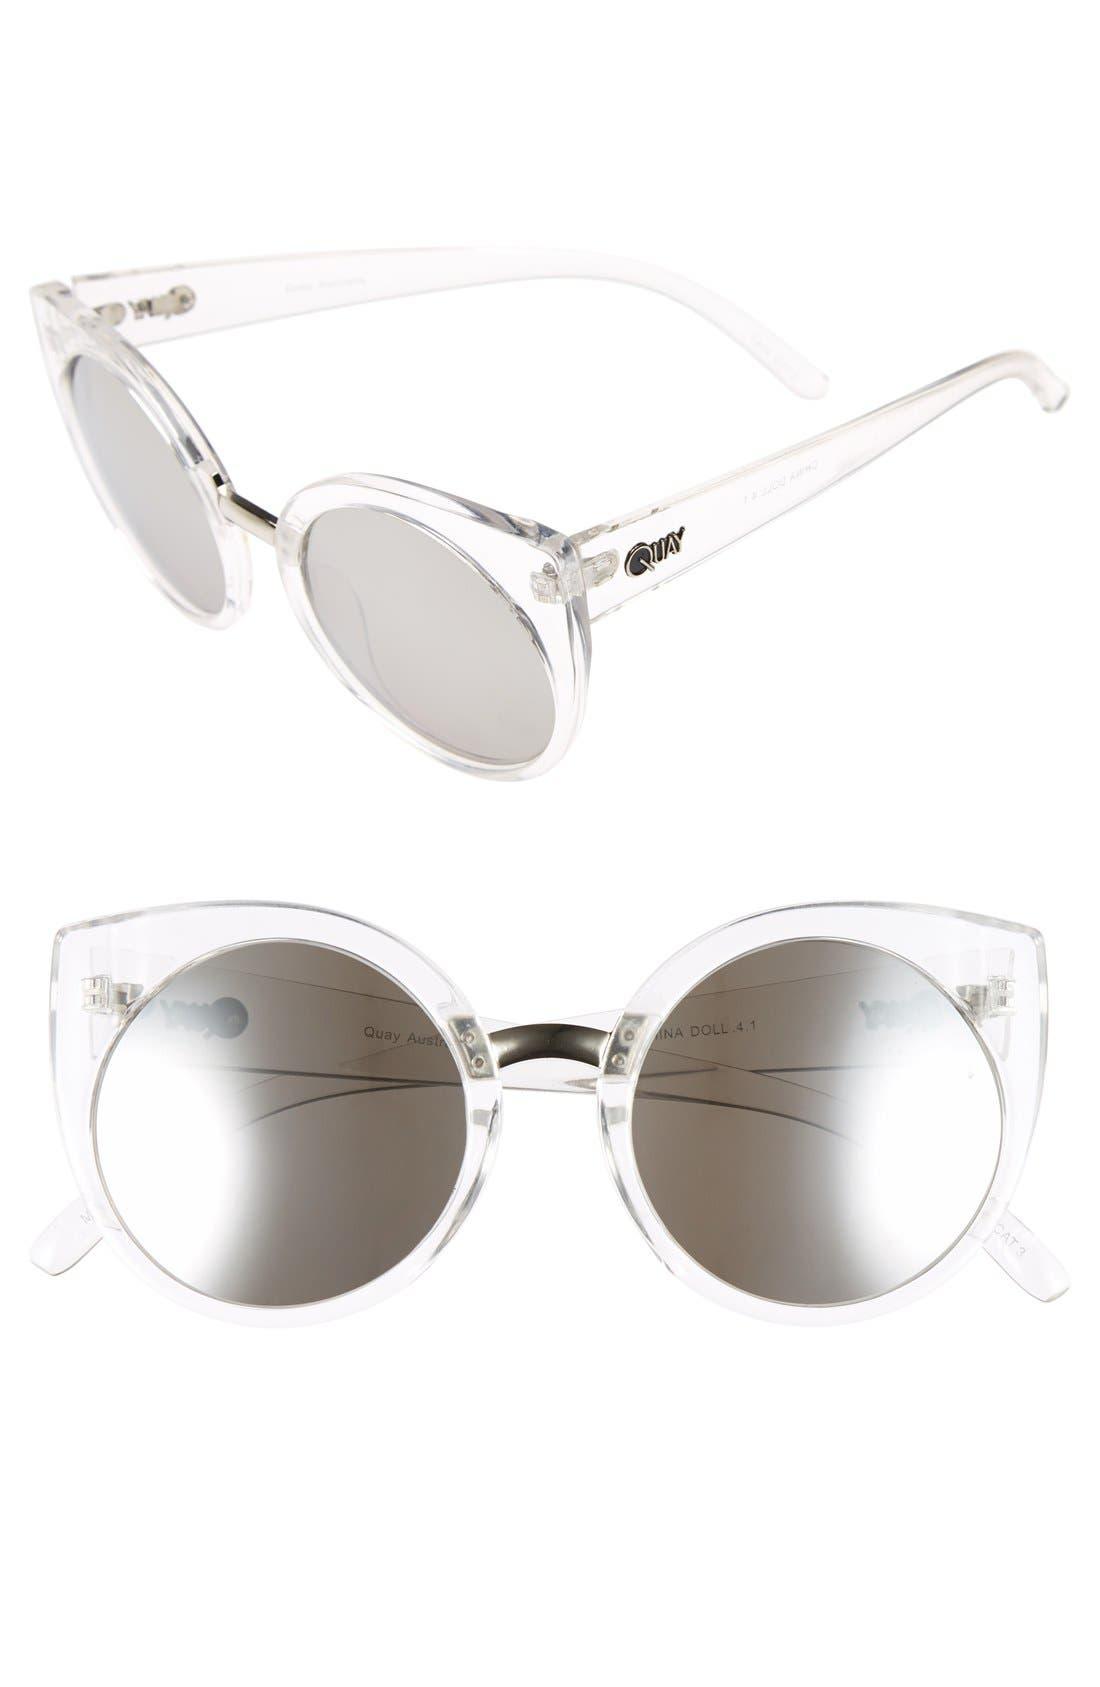 Main Image - Quay Australia 'China Doll' 55mm Translucent Cat Eye Sunglasses